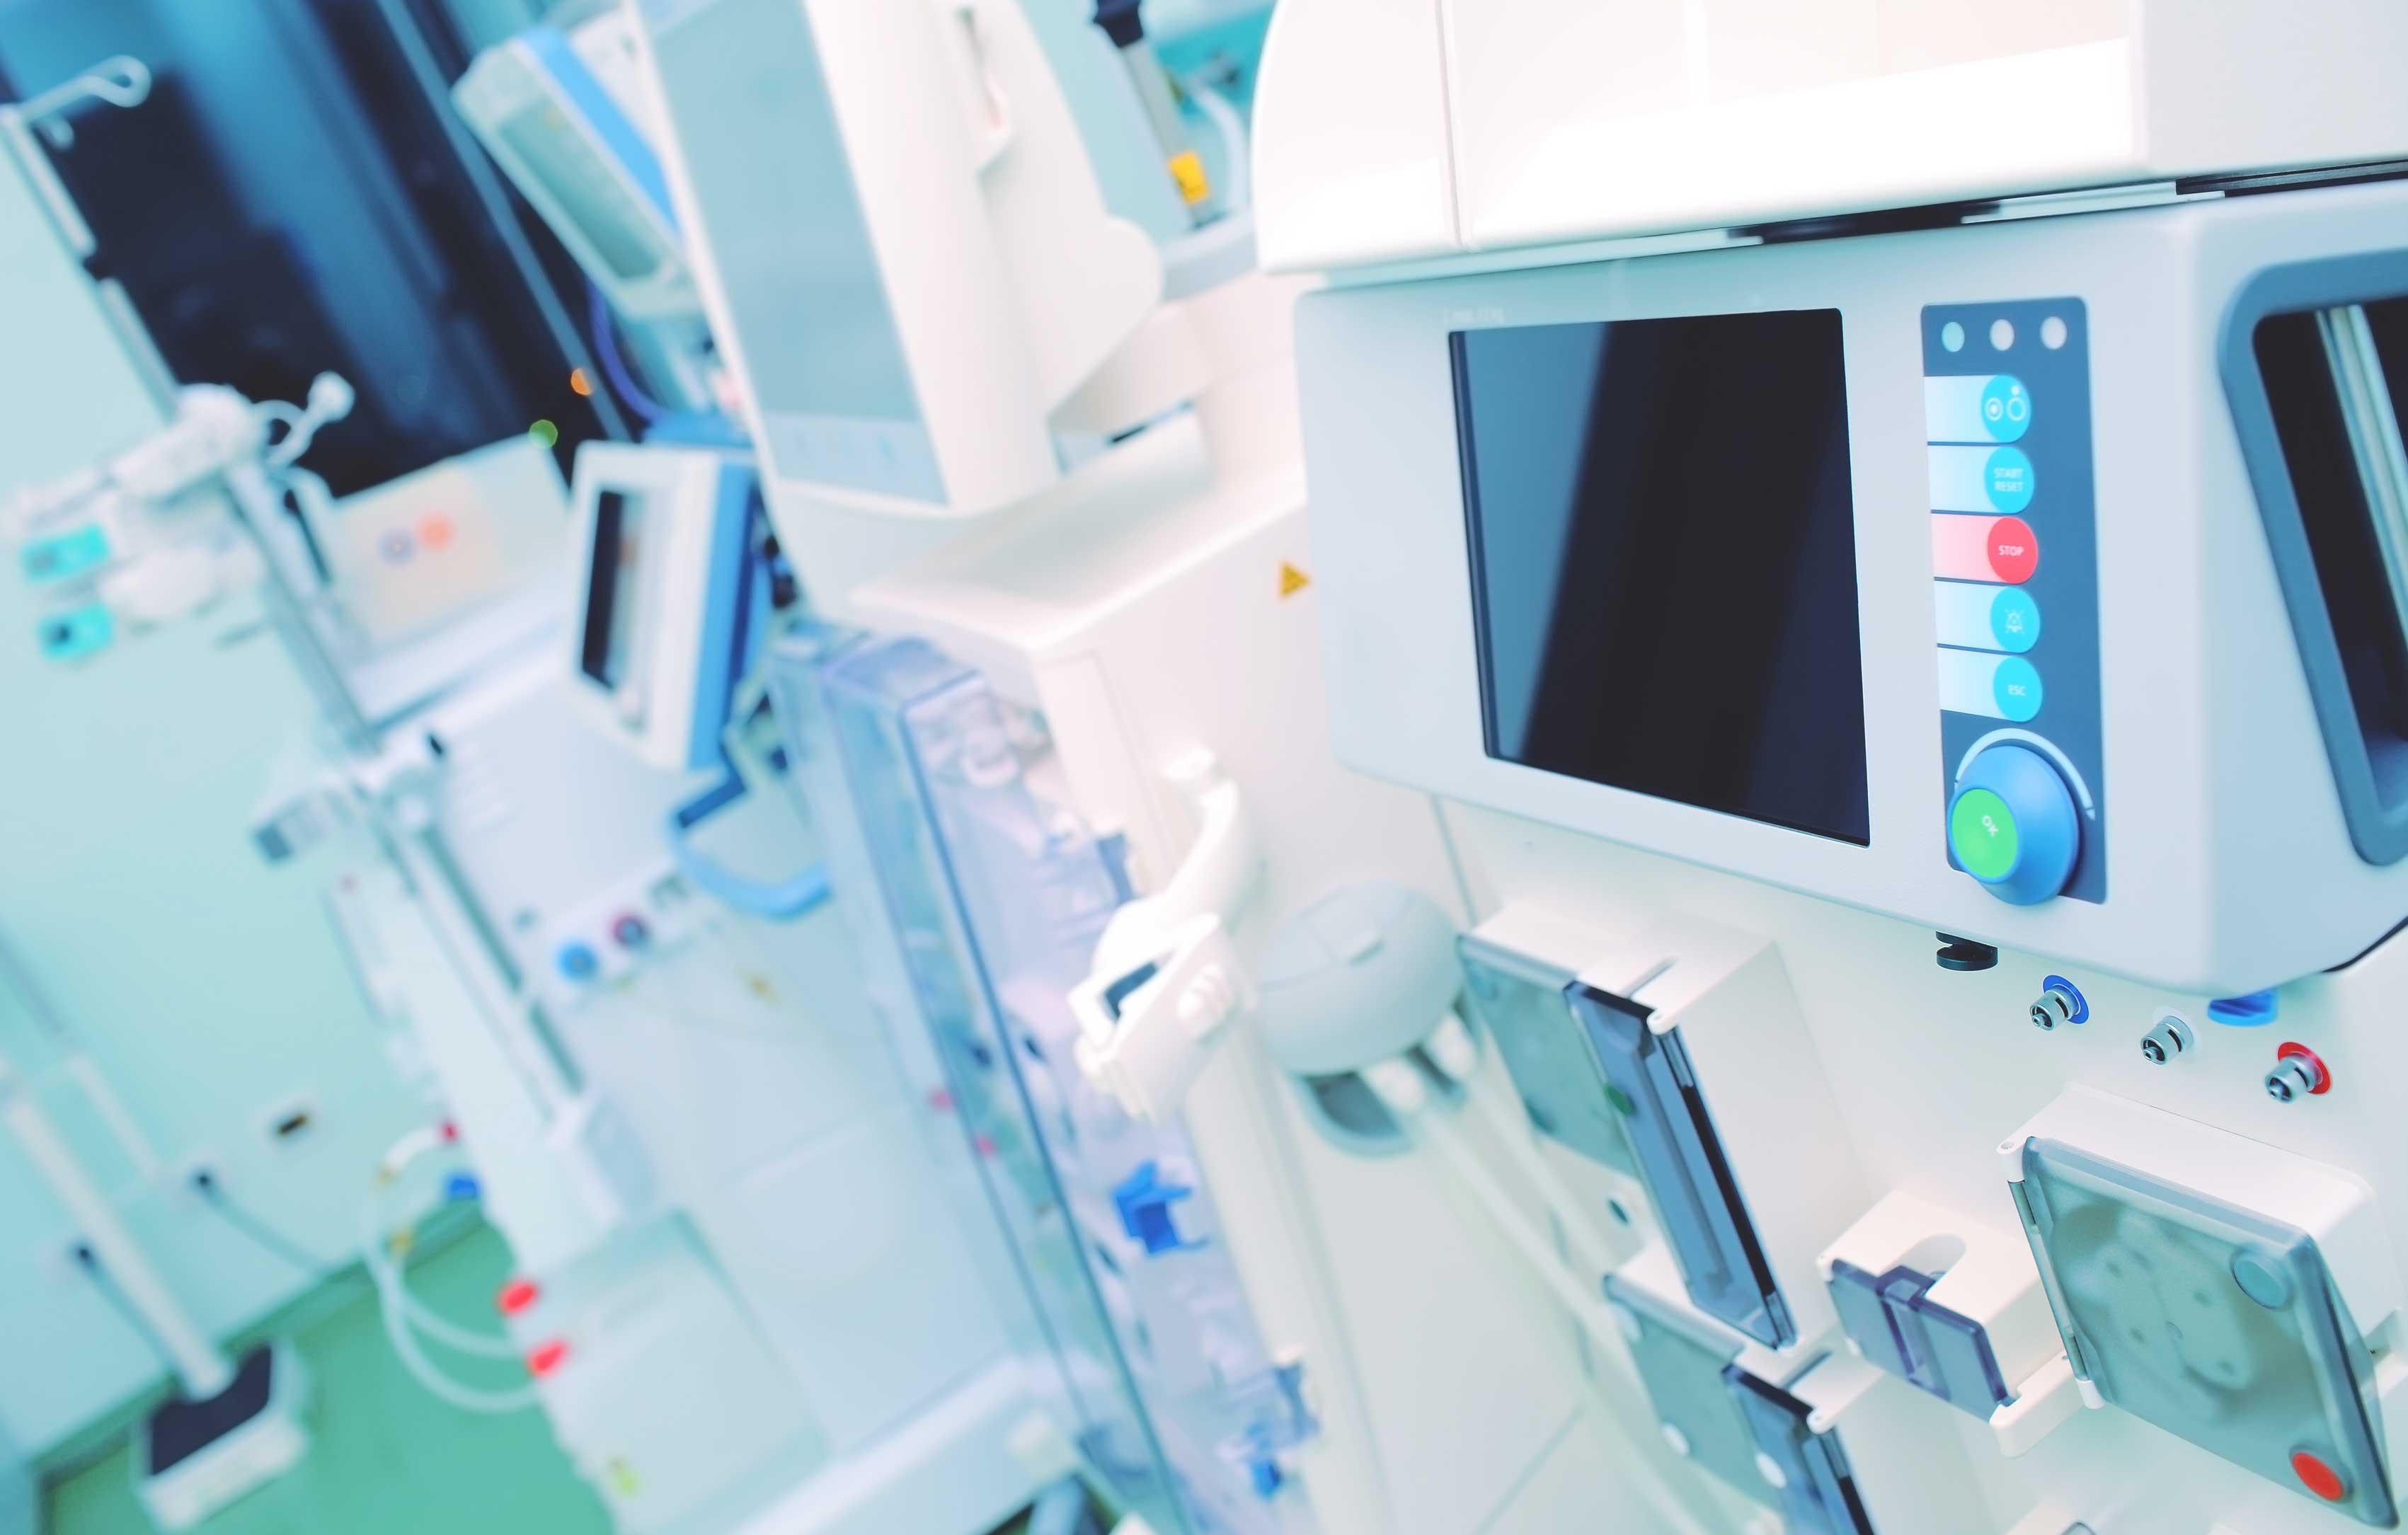 Registered nurse operating room henry ford health system west bloomfield mi